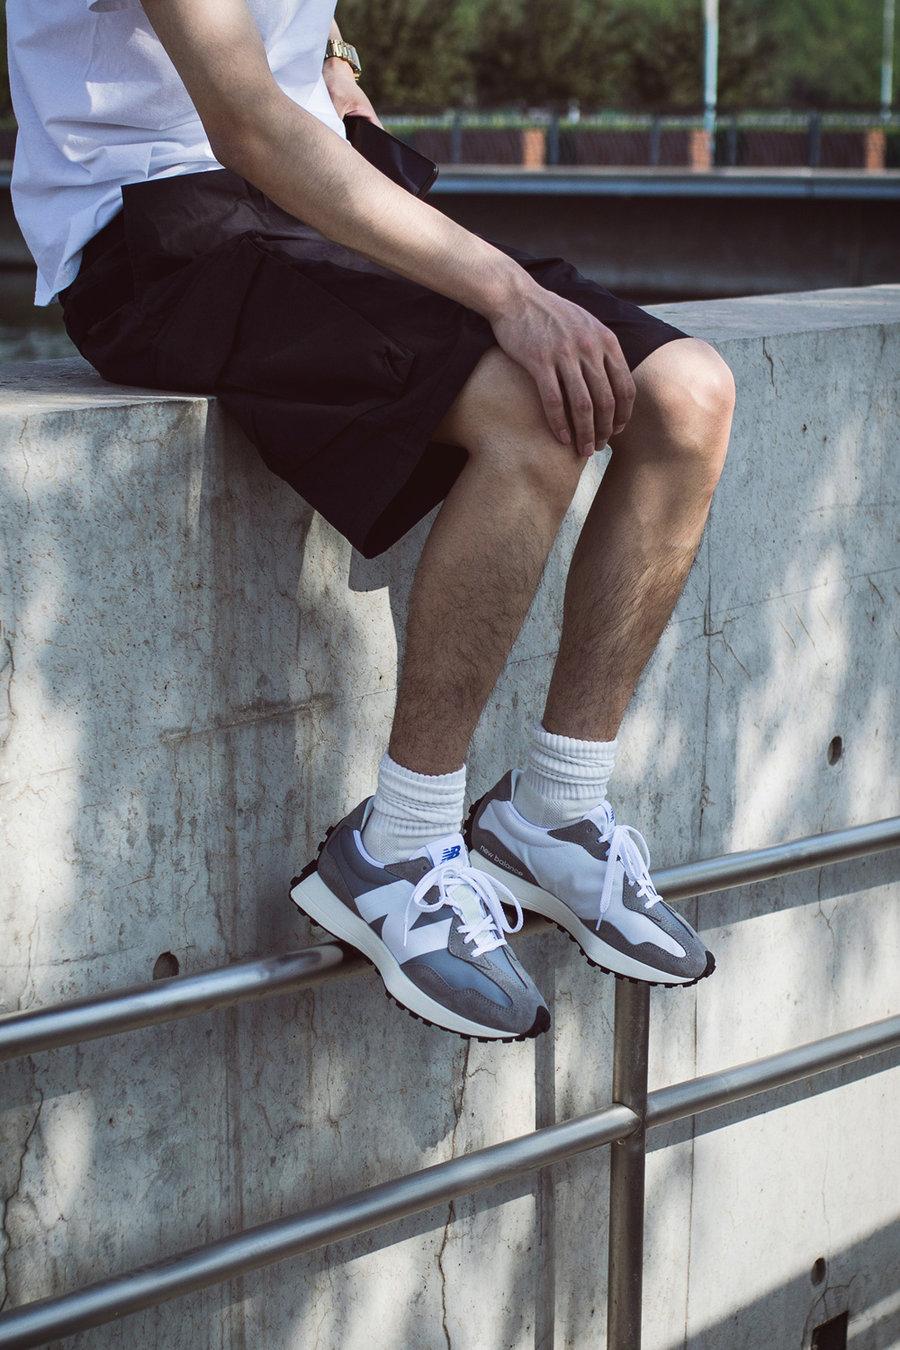 New Balance 327,NB  近期最大黑马!不靠余文乐这双鞋也超火!但是听我的先别买!